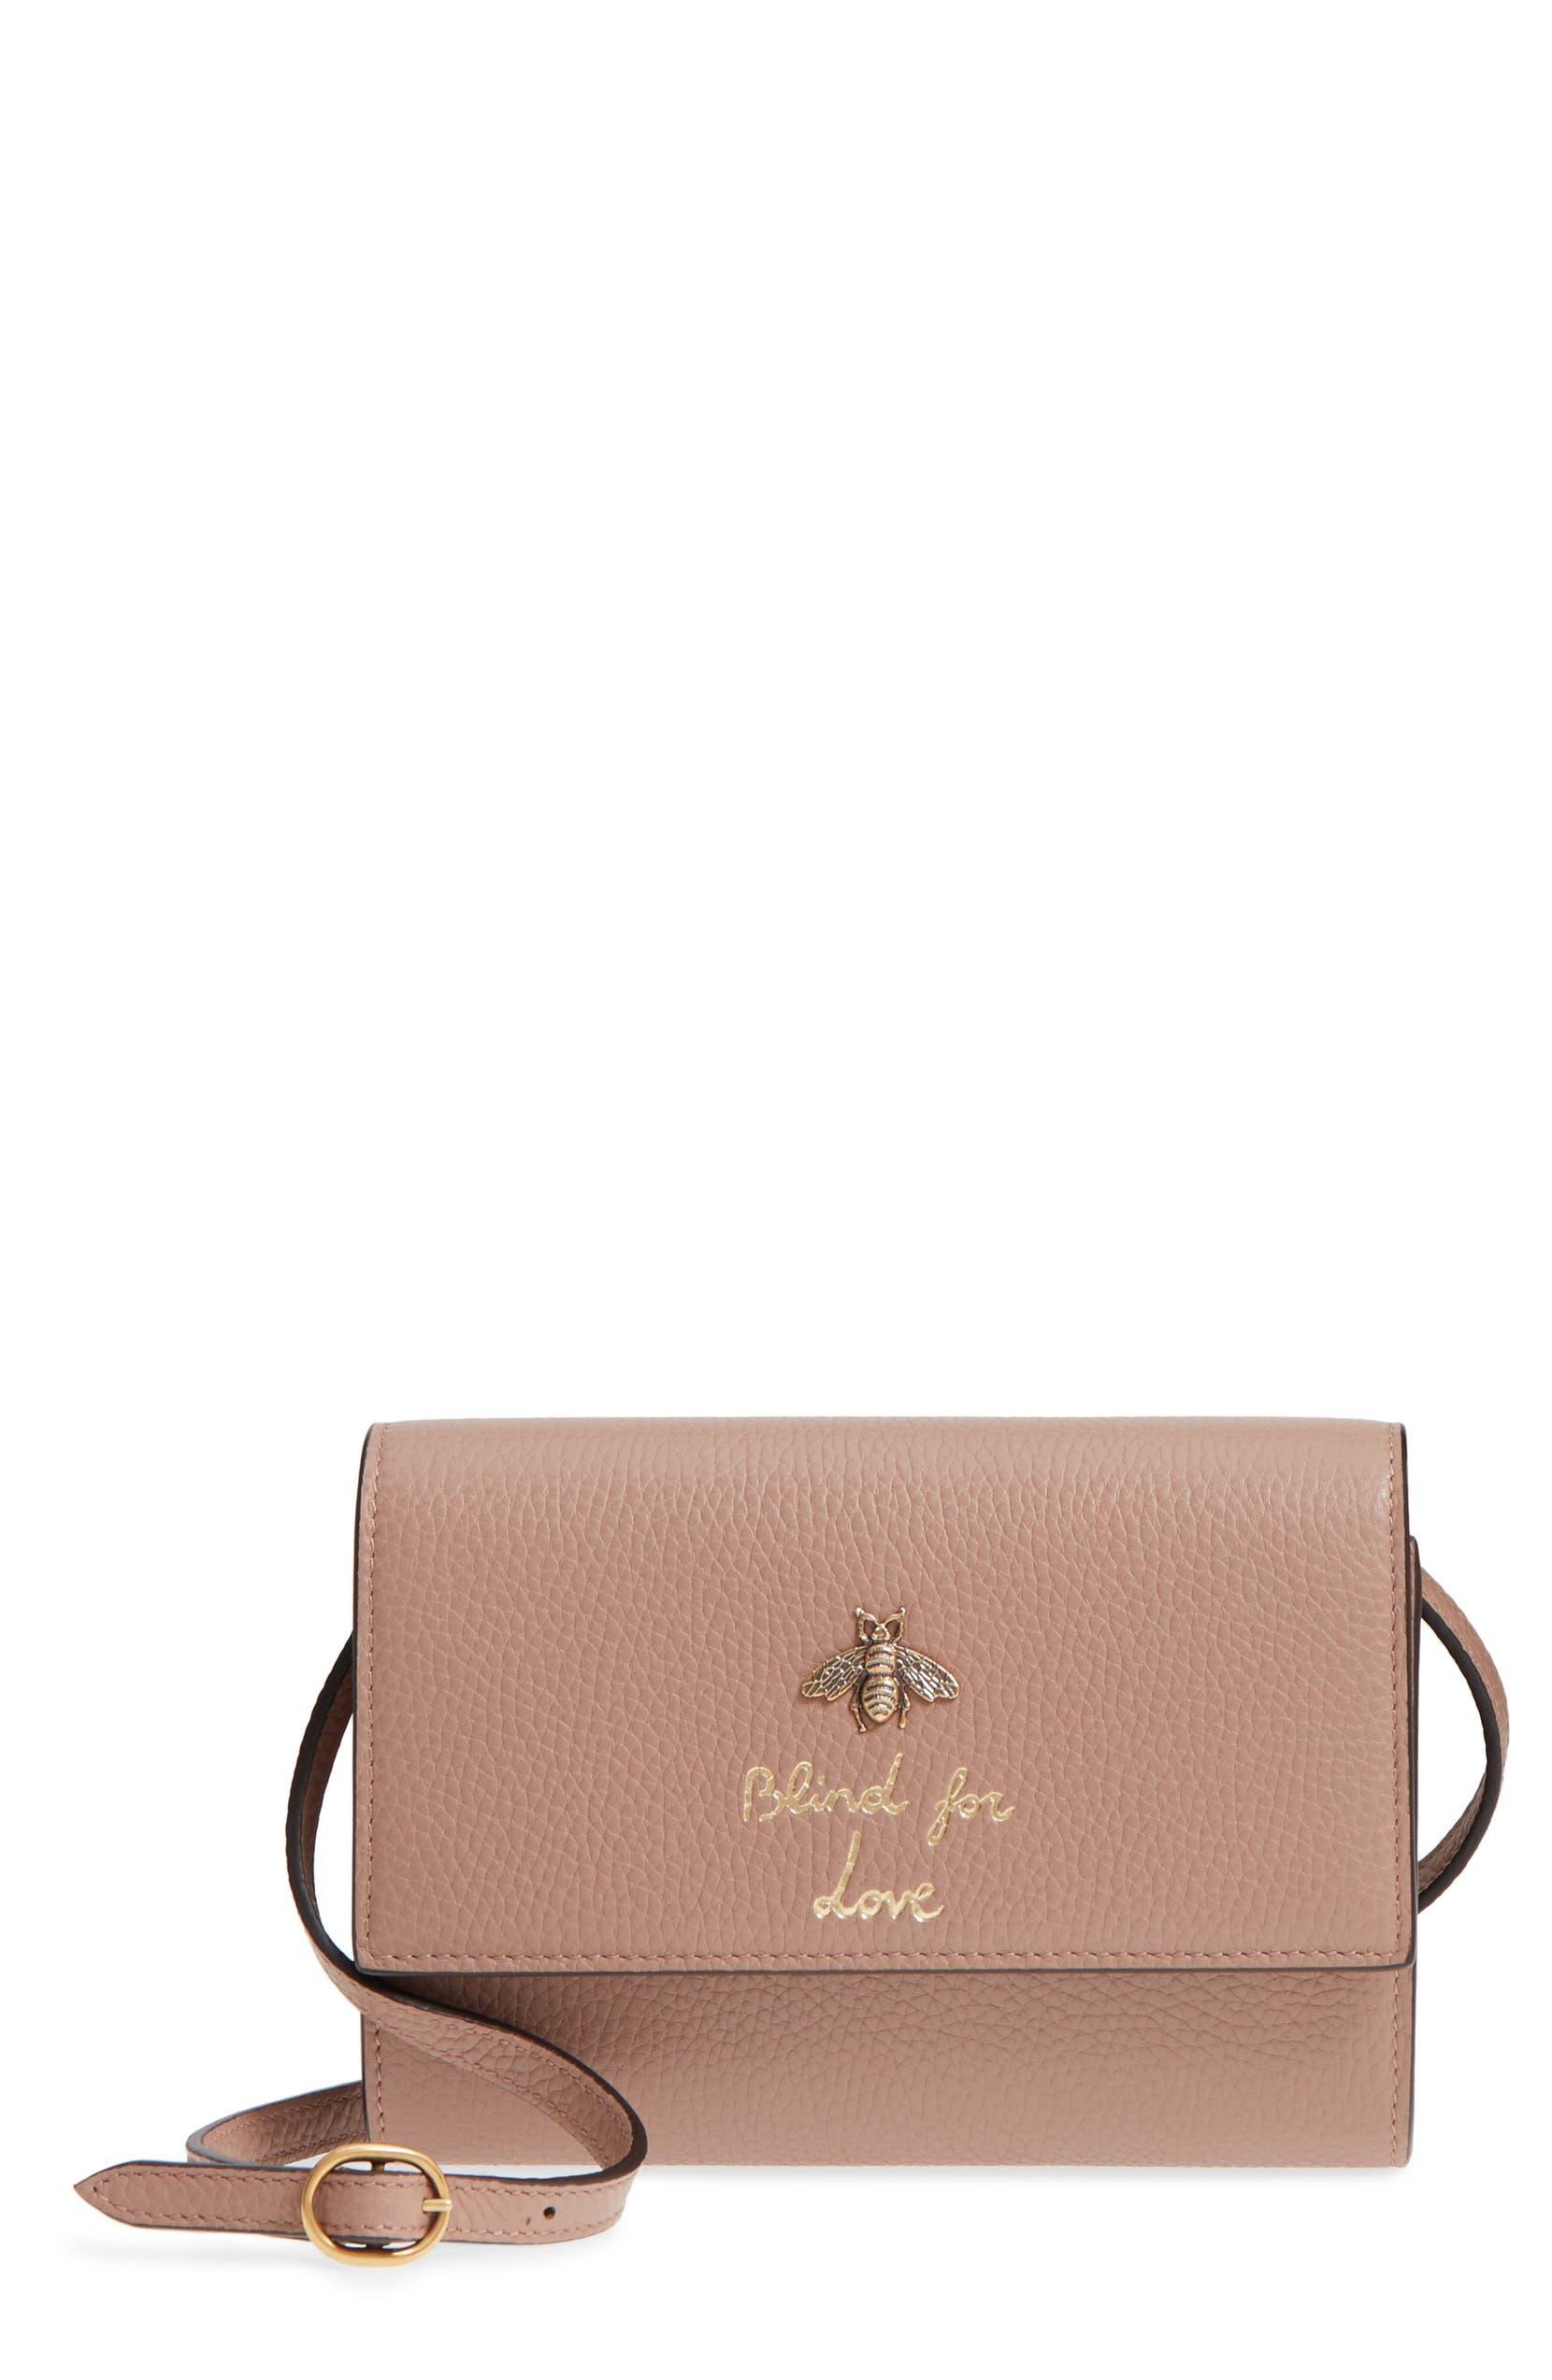 de4c64c183a9 Gucci Animalier Bee Leather Wallet | Nordstrom